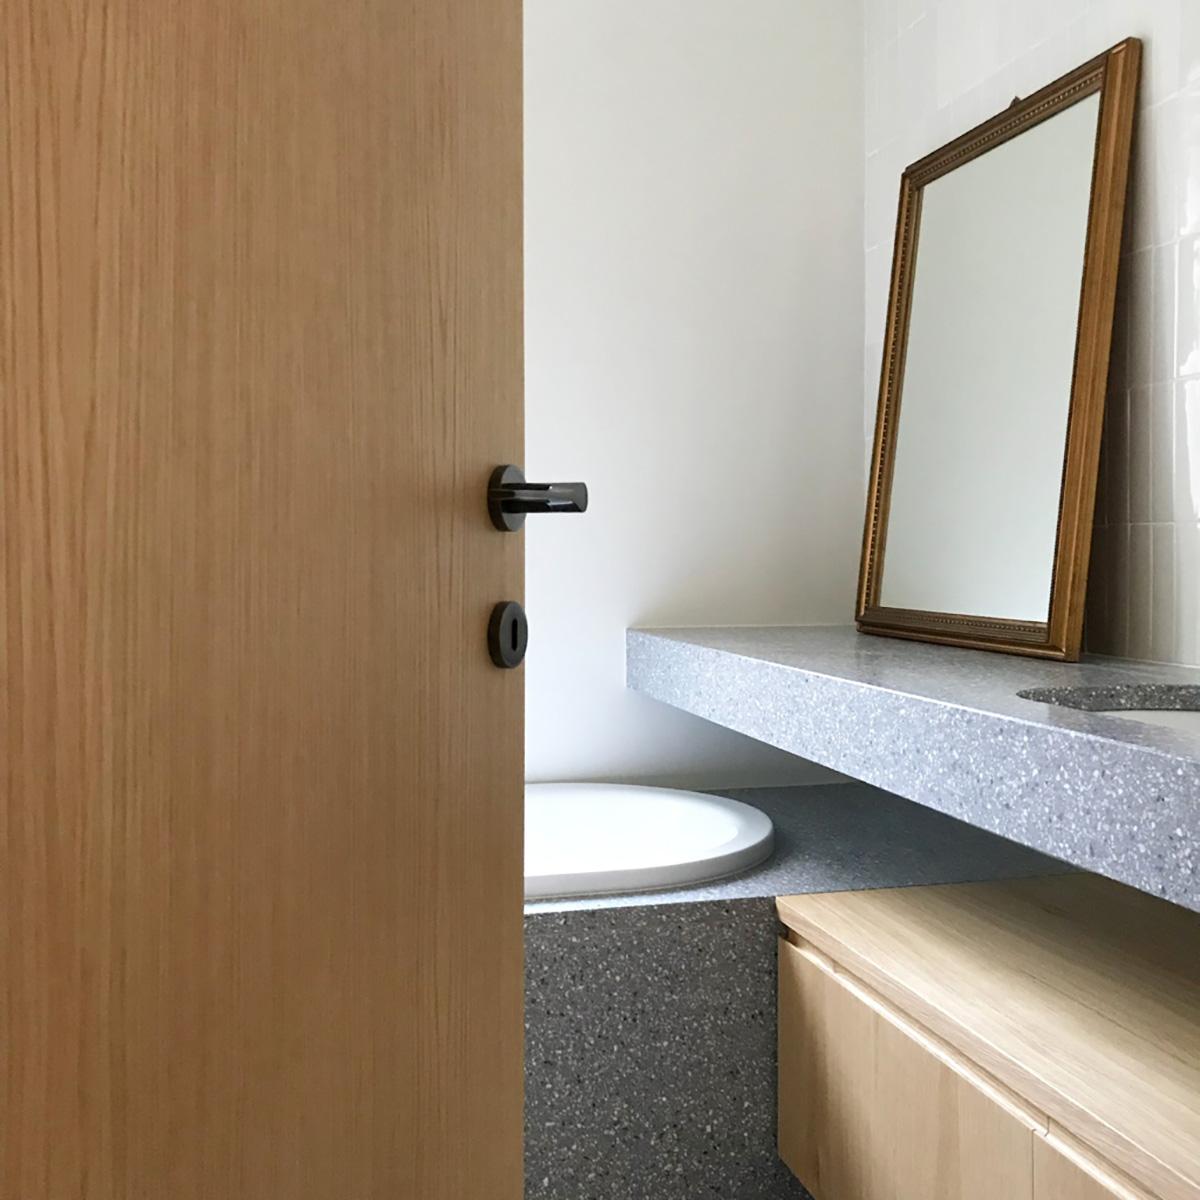 kickoffice casa ac bathroom door toilet